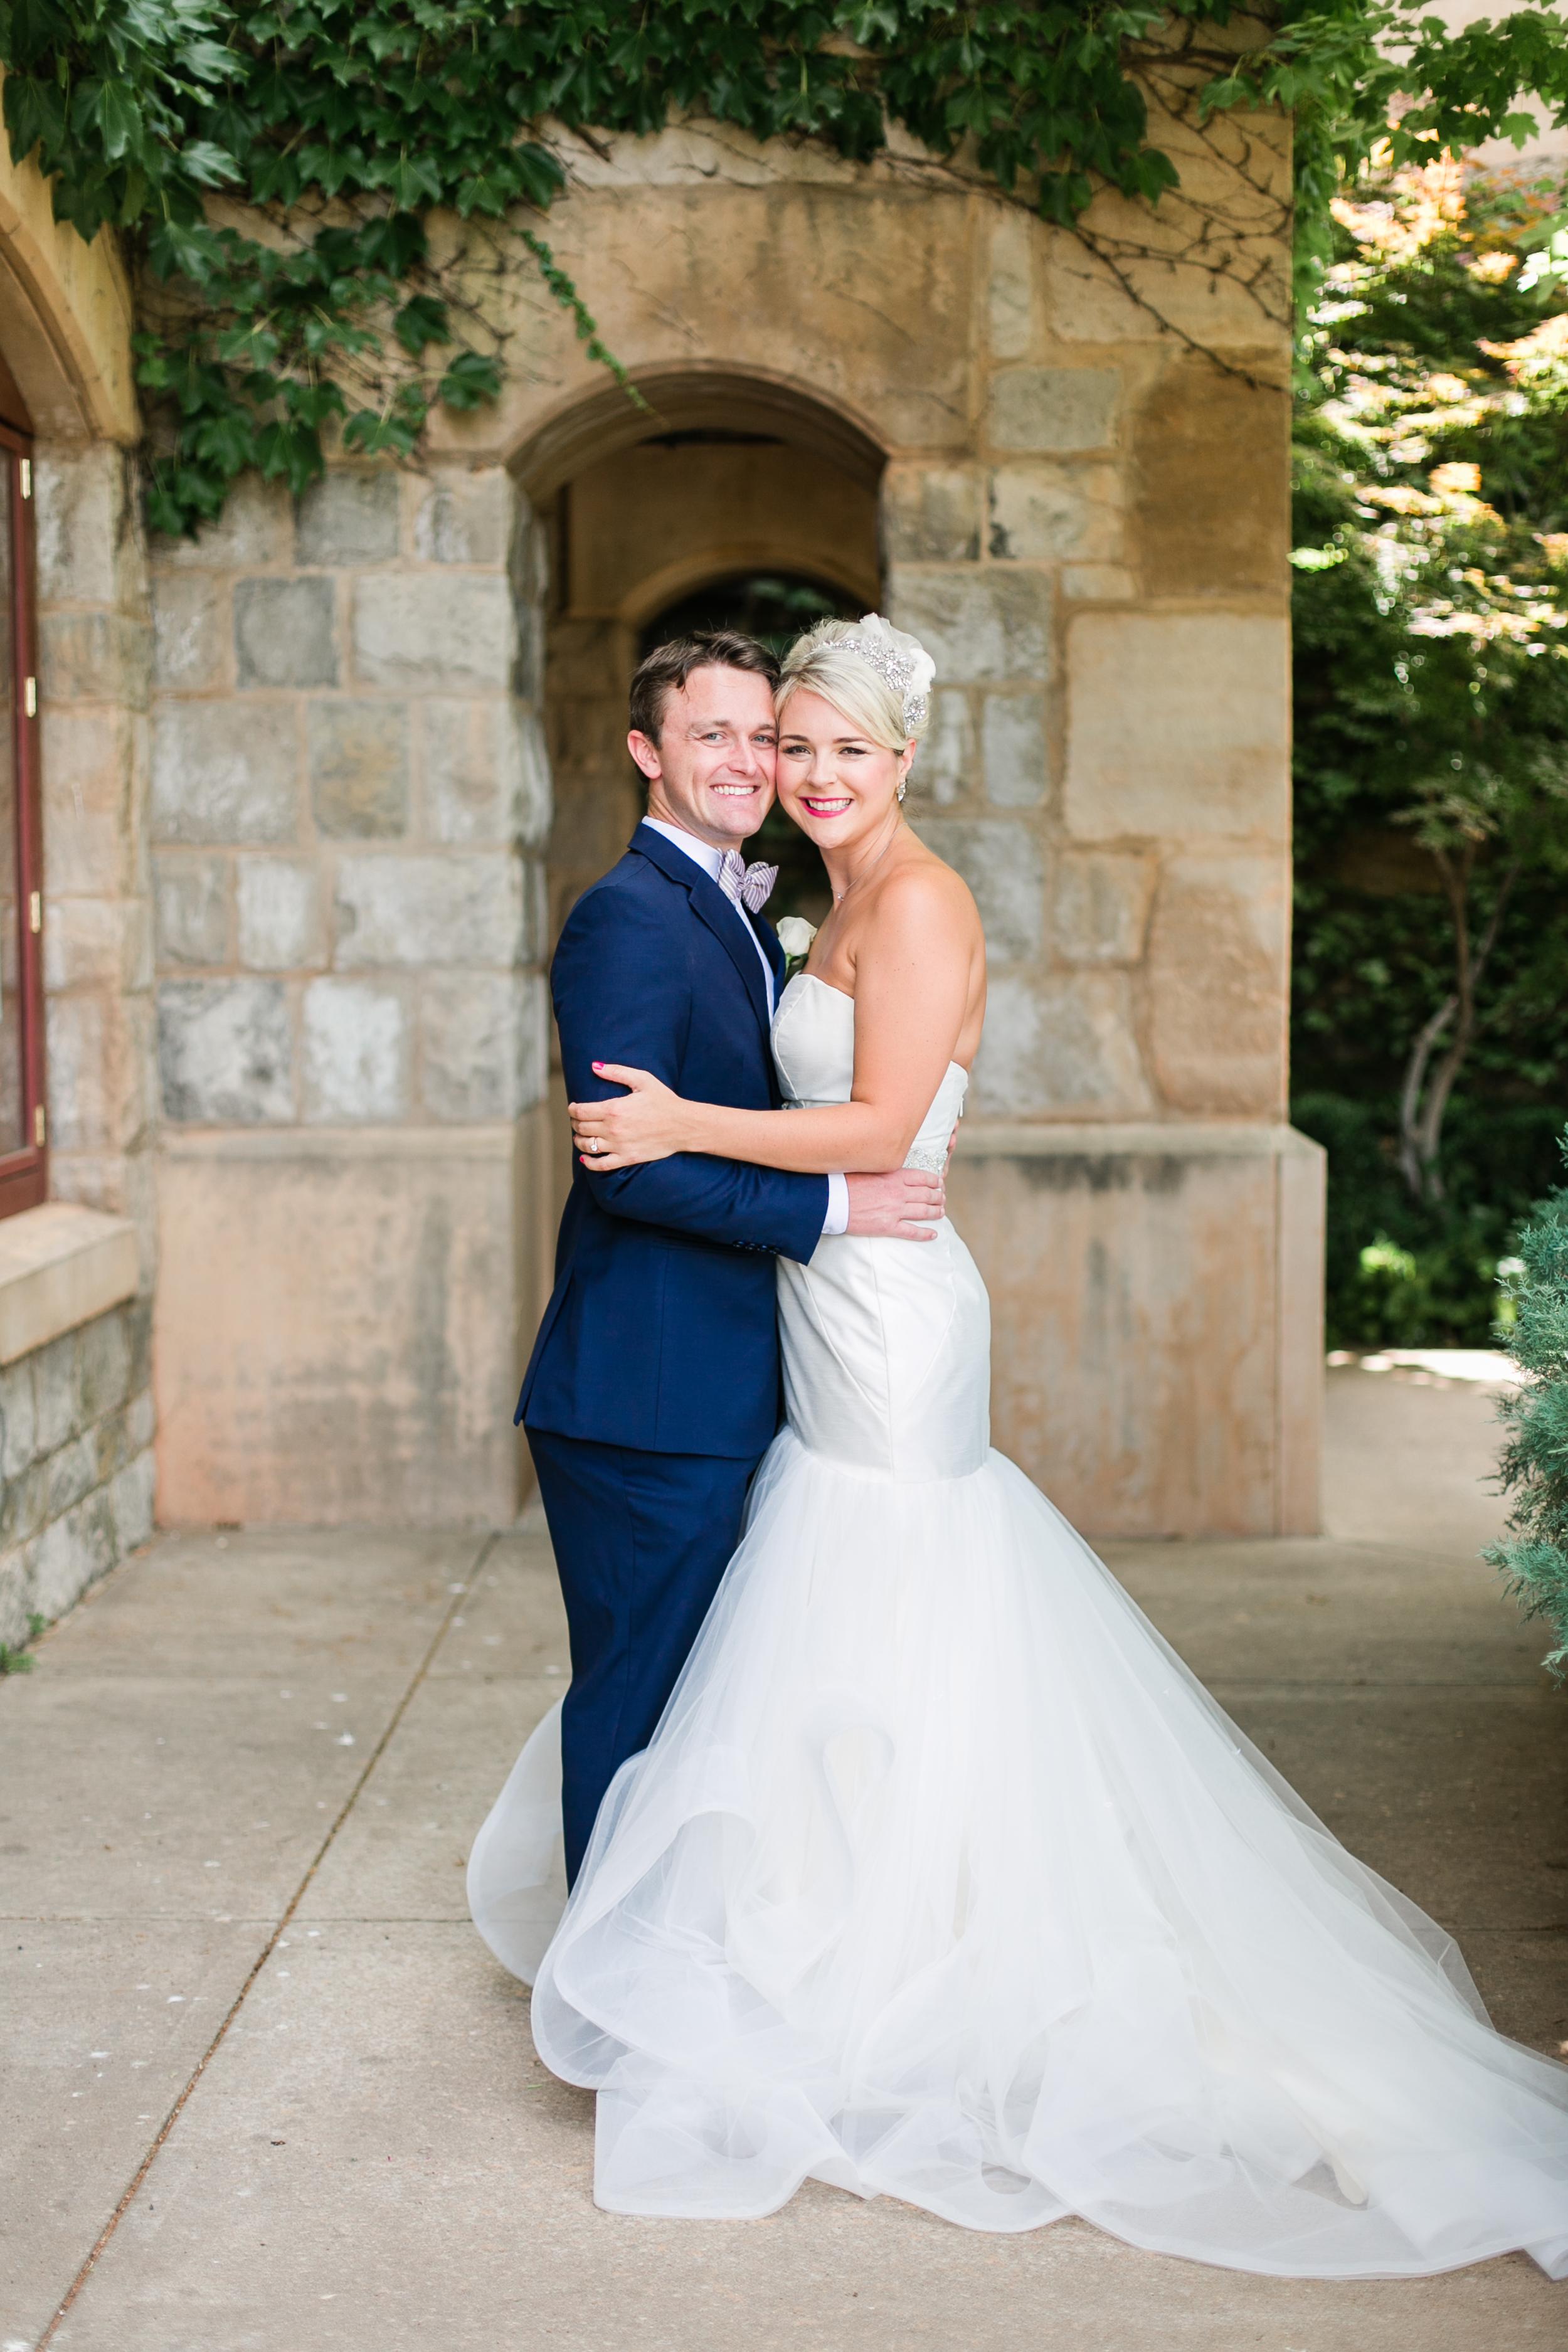 Bliss OKC | Aubrey Marie Photography | Wedding Dress | Wedding Day | Hayley Paige